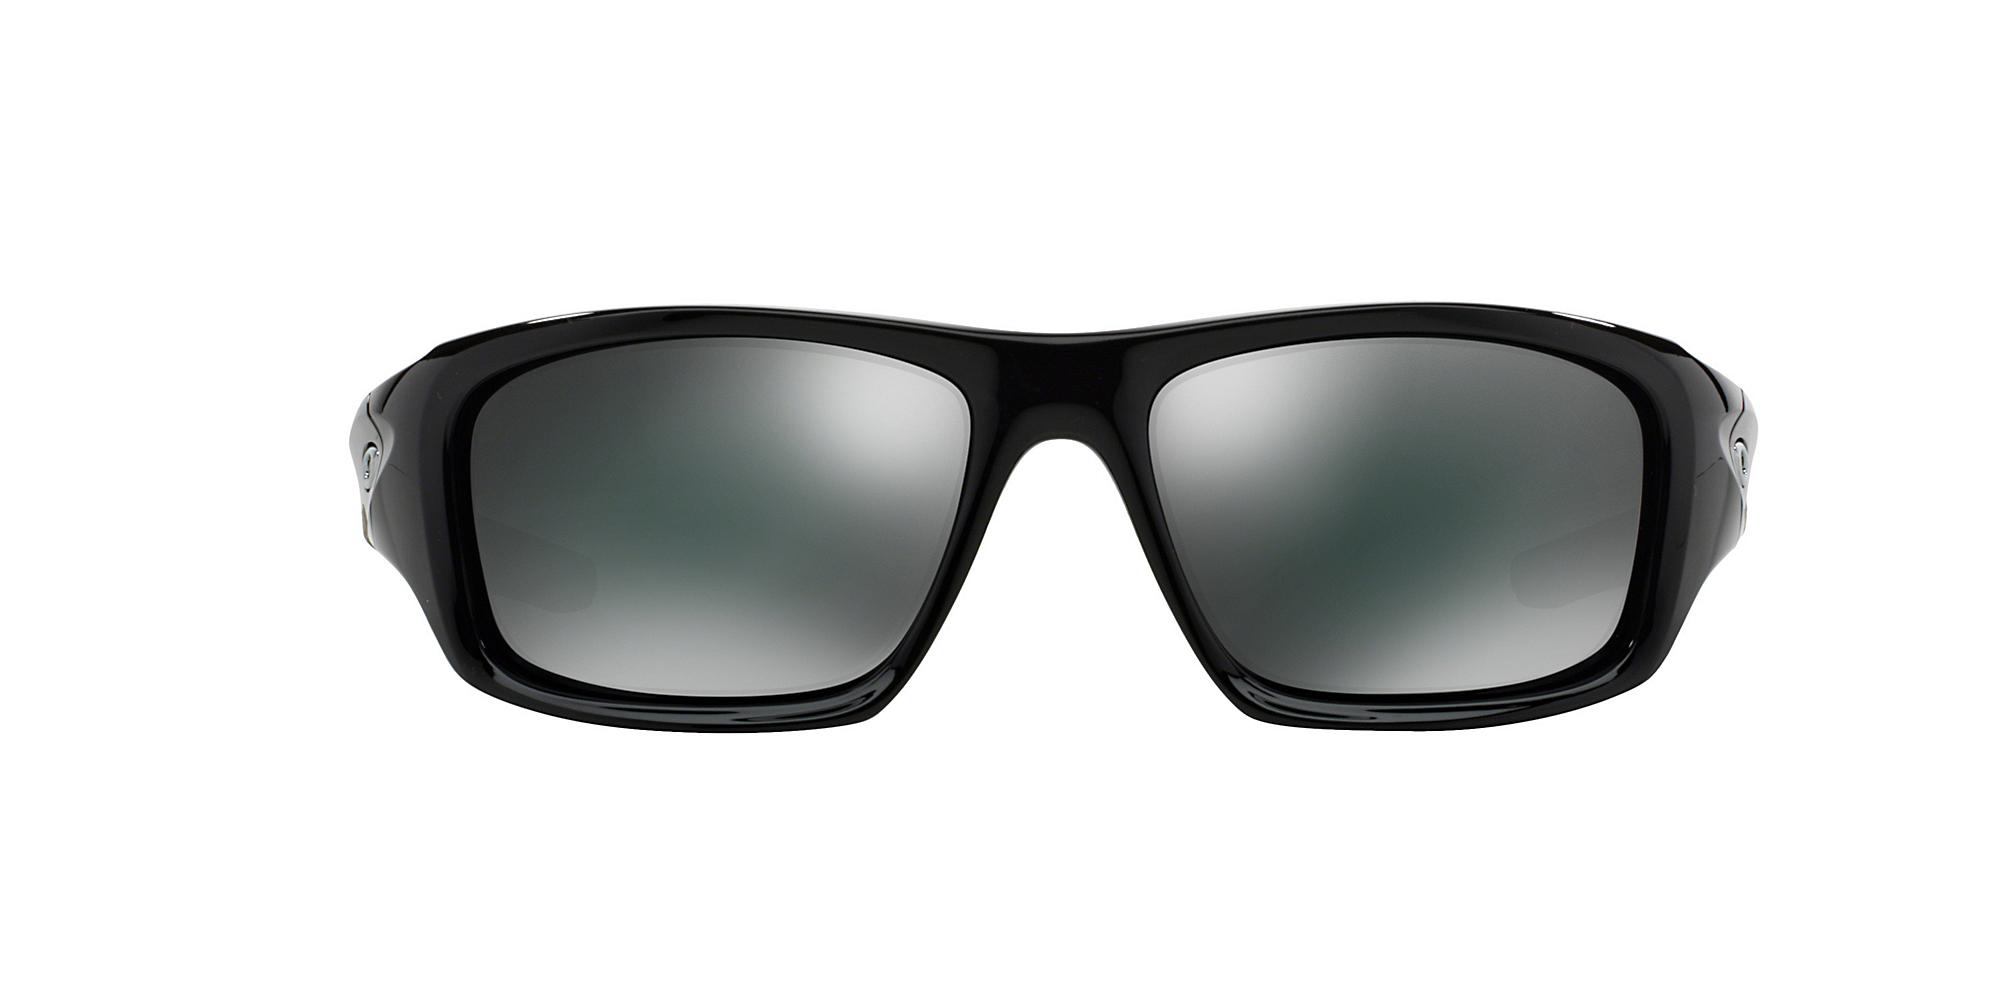 oakley valve sunglasses review b7vy  OAKLEY OO9236 VALVE SUNGLASSES